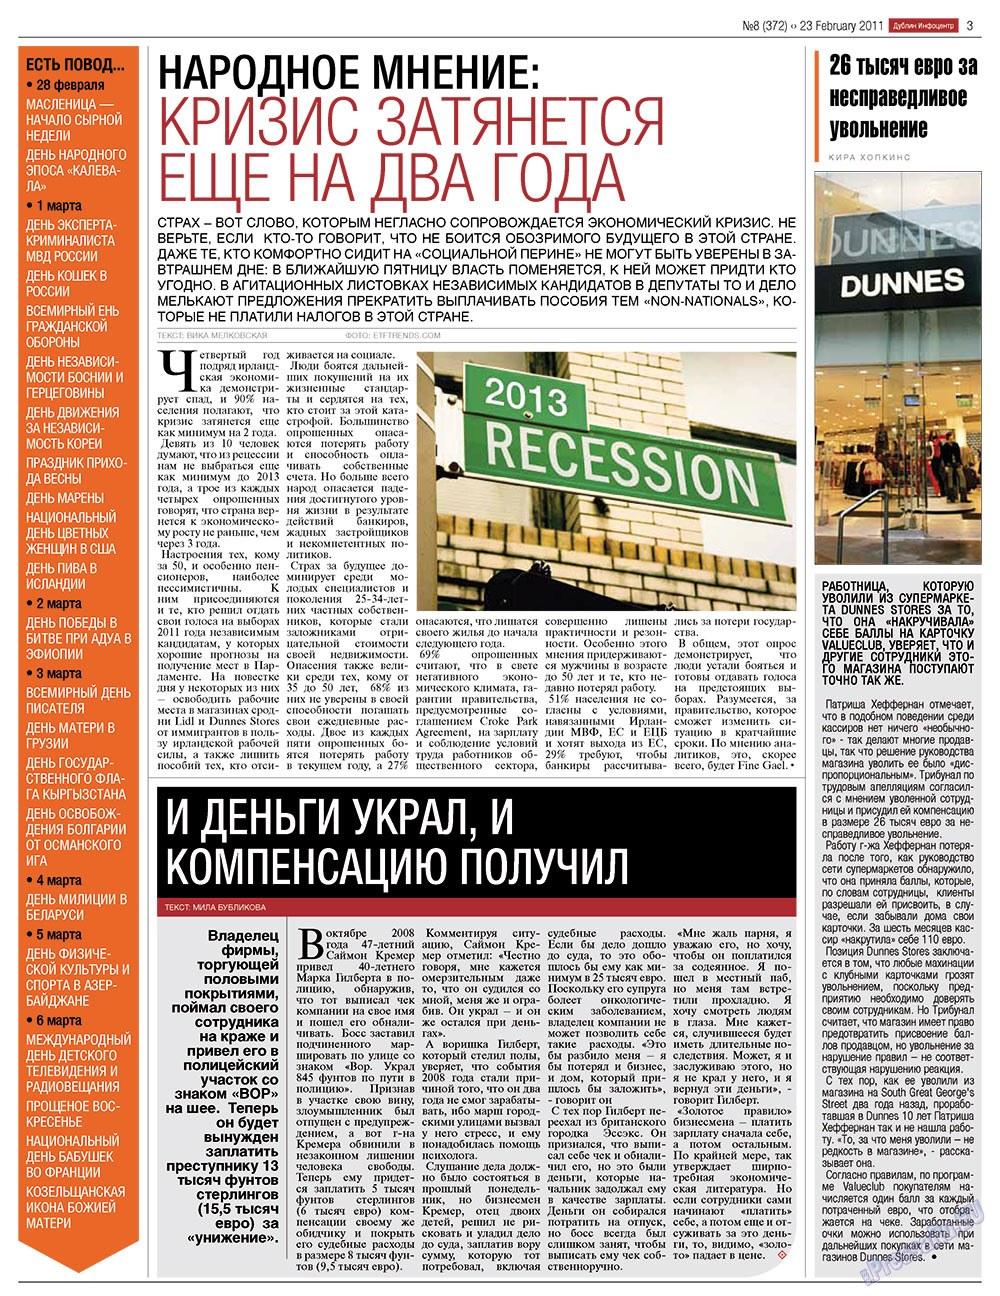 Дублин инфоцентр (газета). 2011 год, номер 8, стр. 3